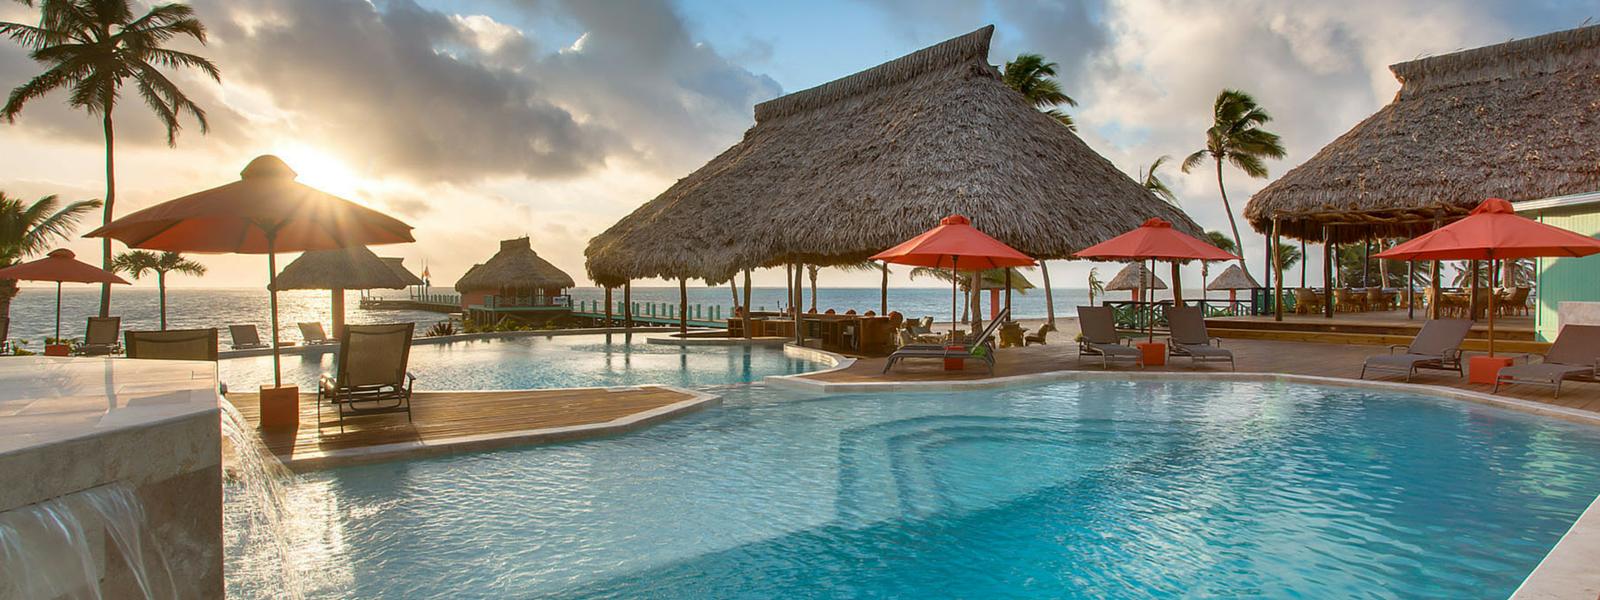 adult vacation rentals